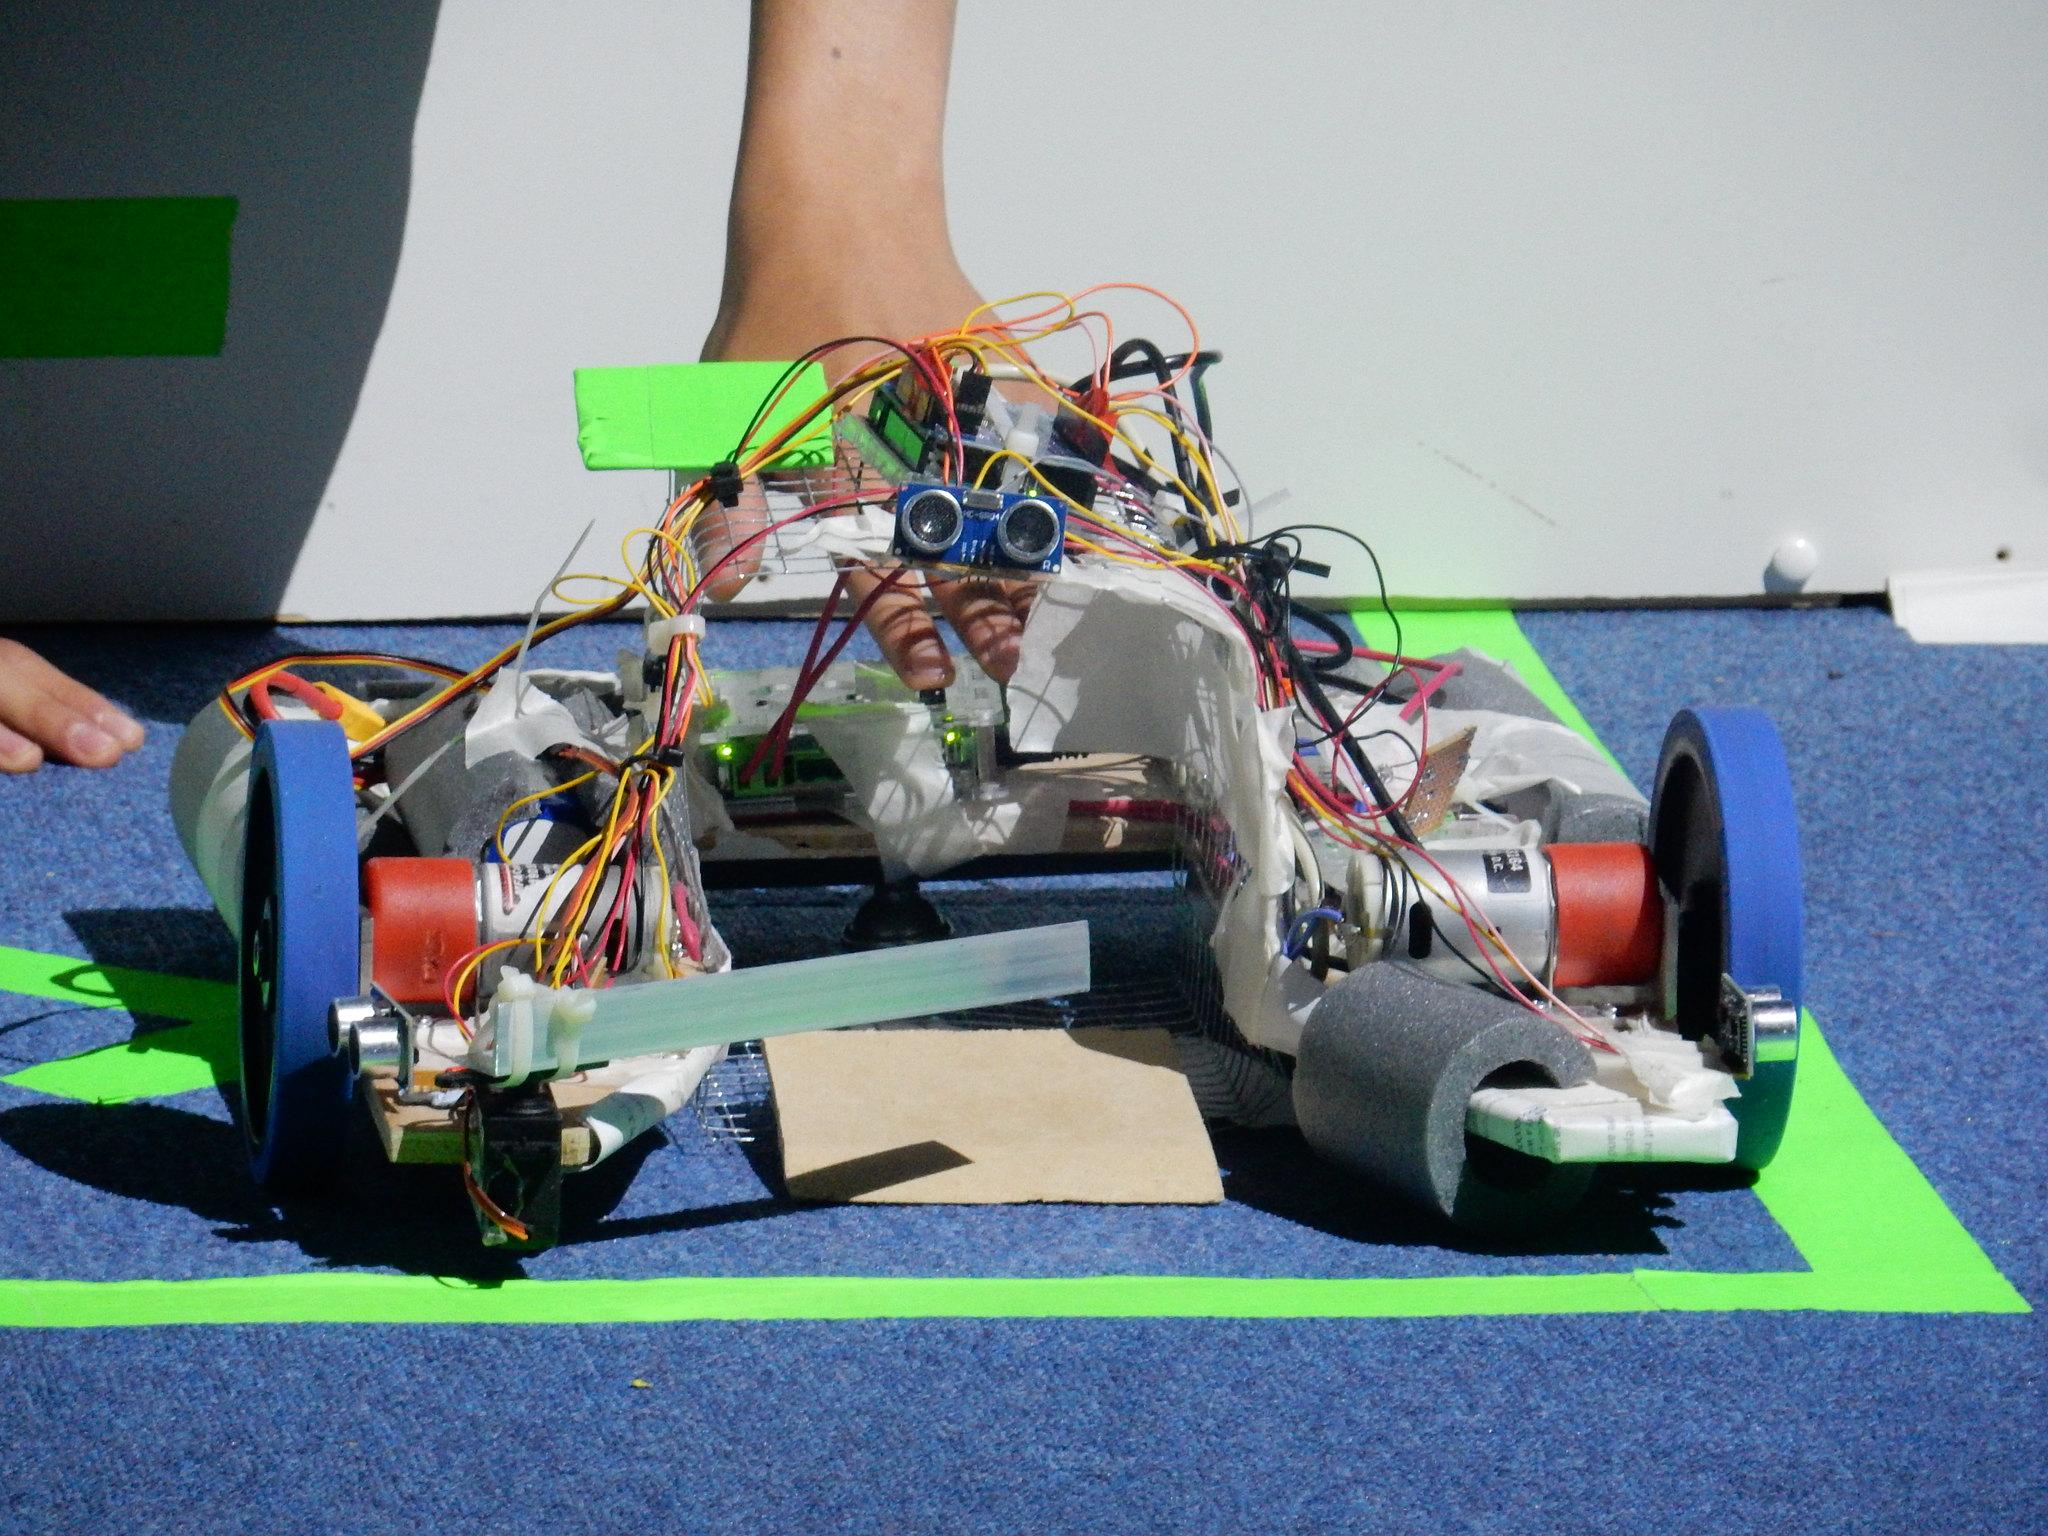 Building friendly robotics software